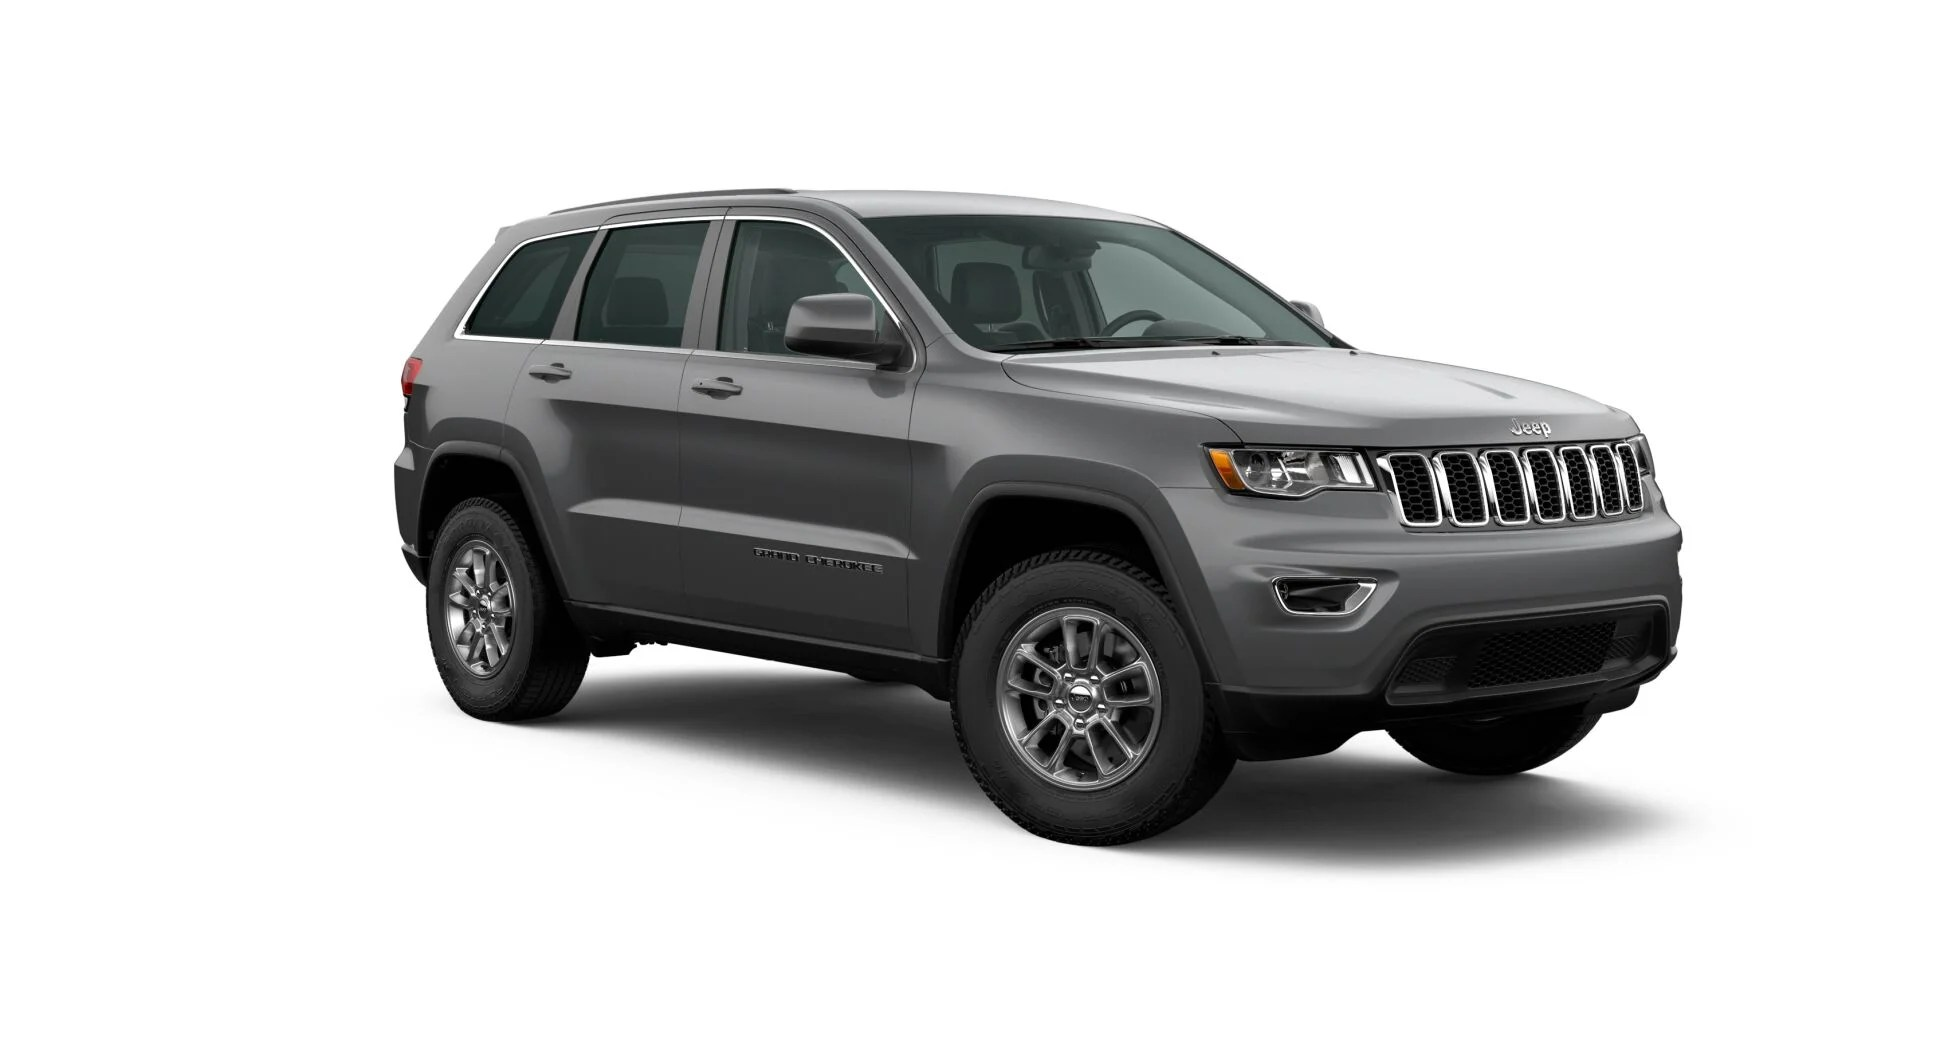 2020 jeep grand cherokee trim levels